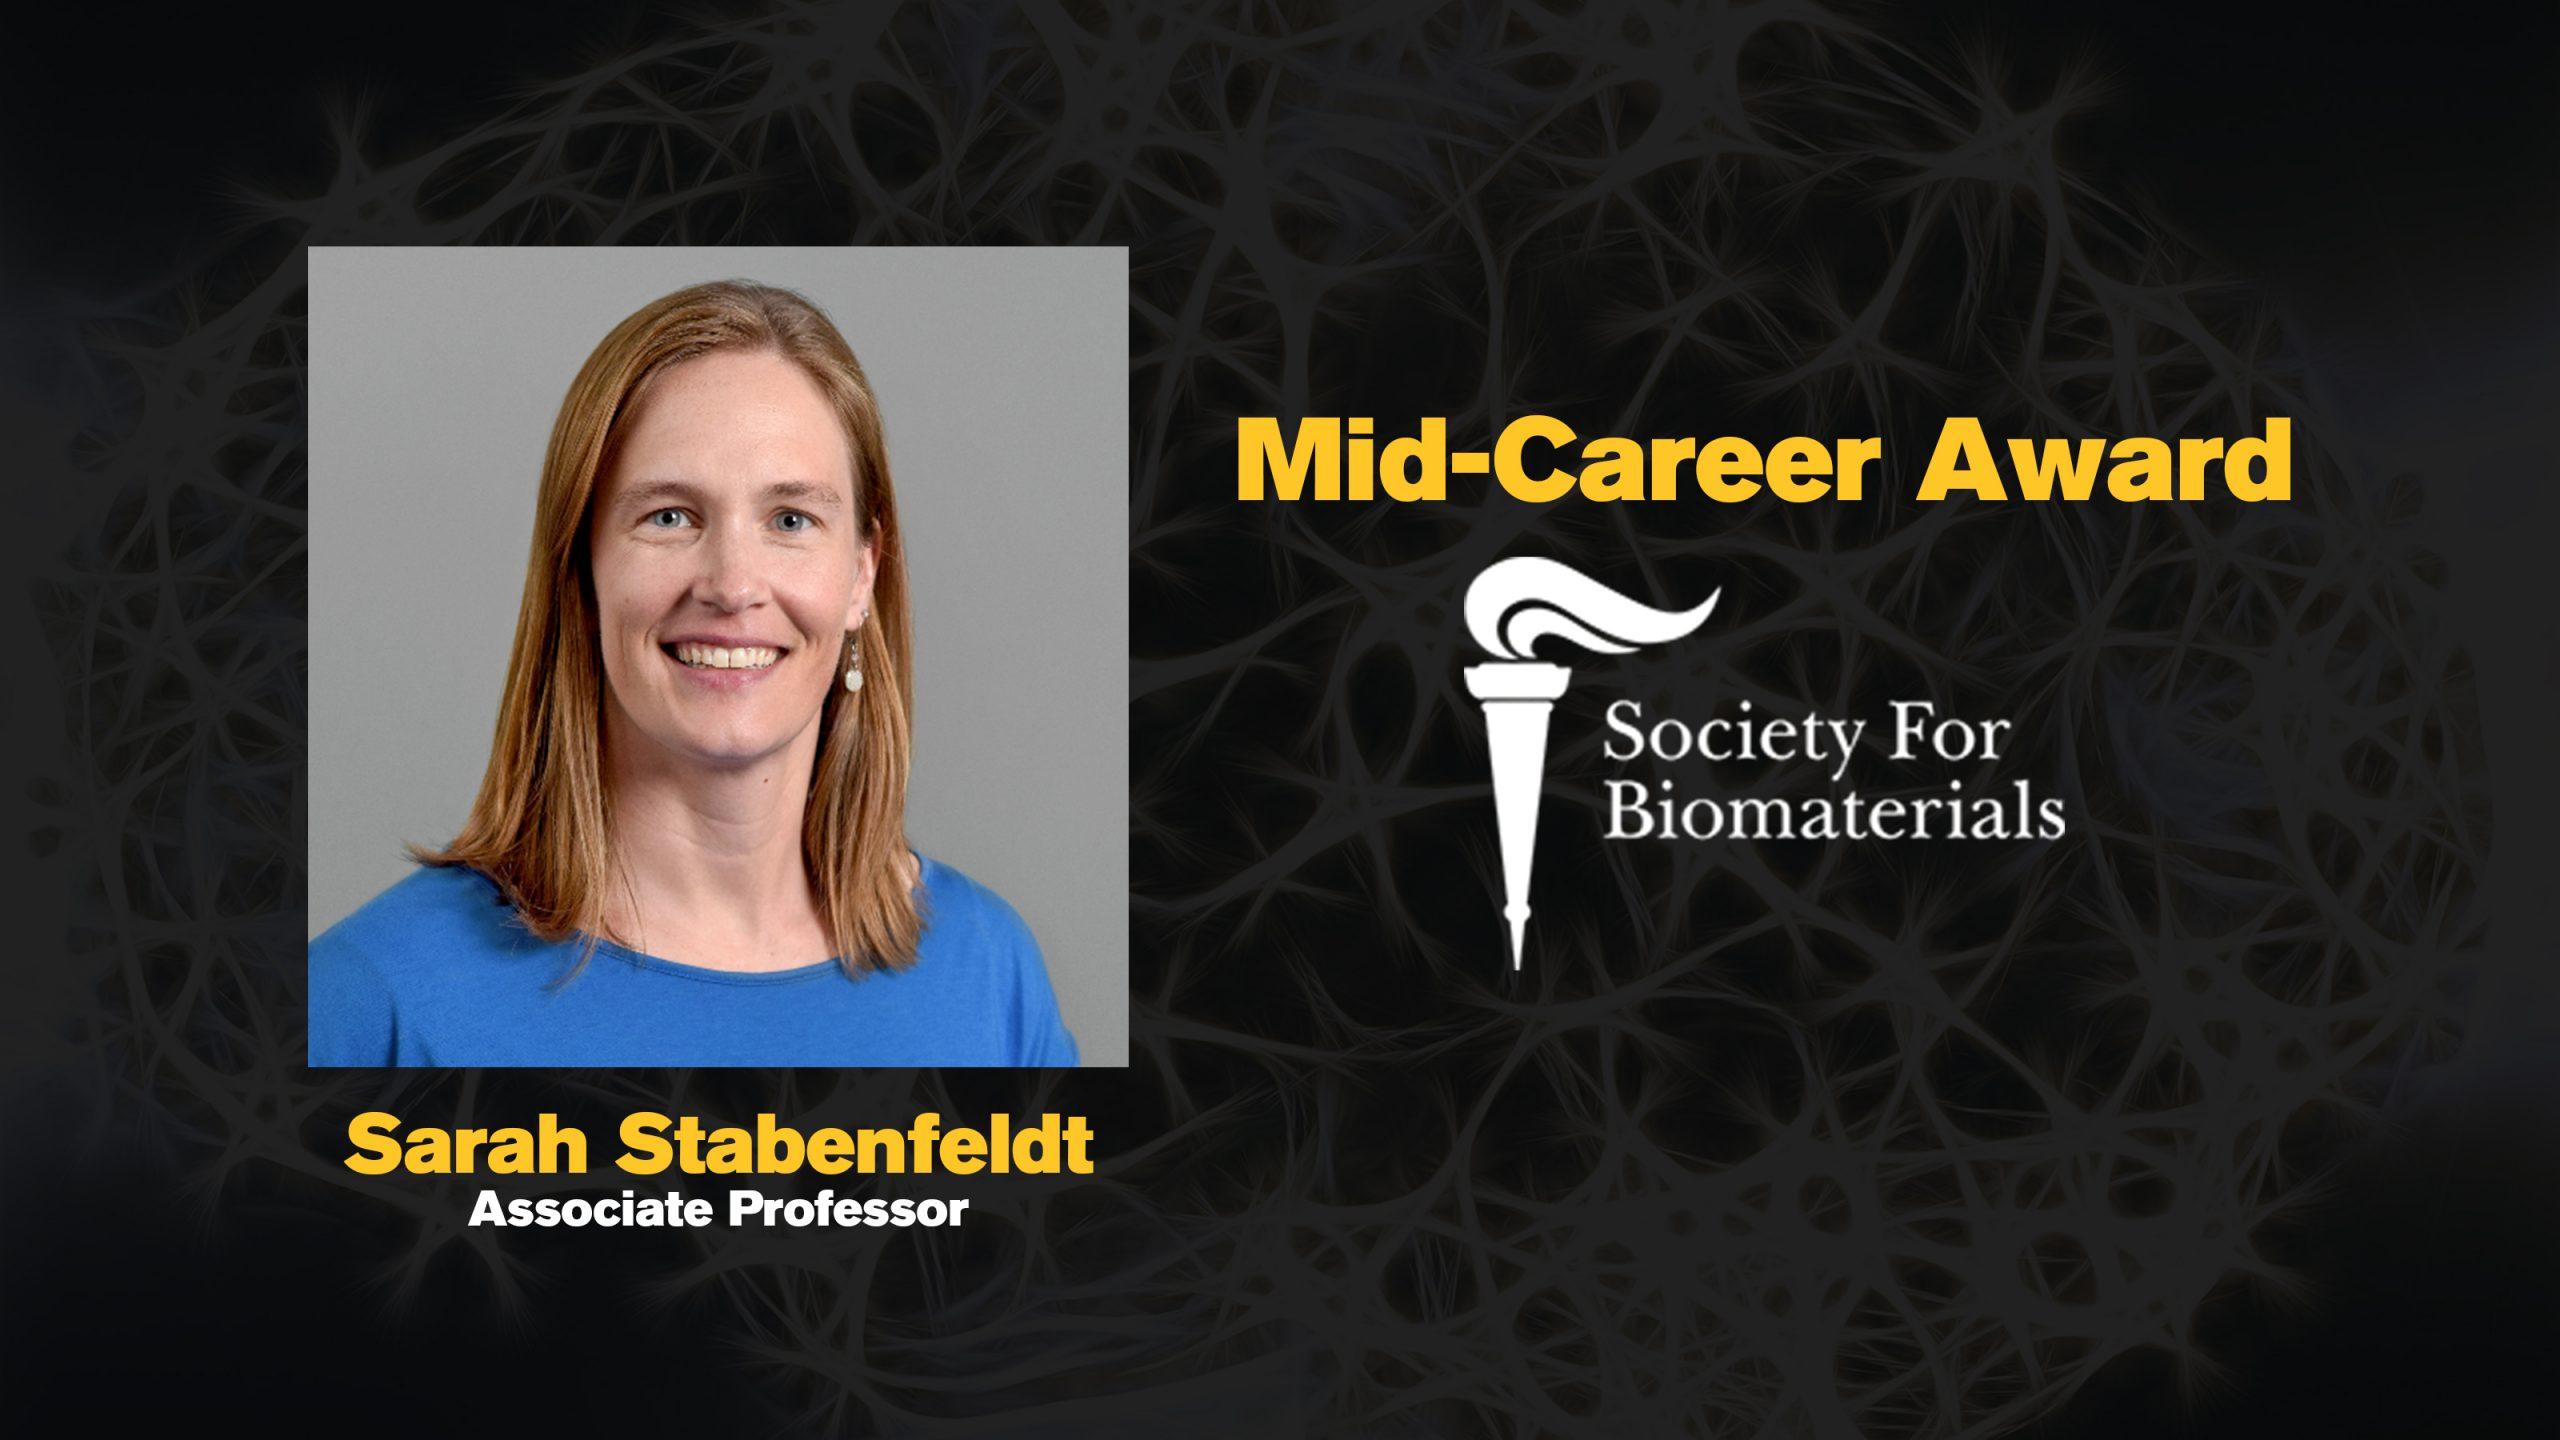 Sarah Stabenfeldt photo that says Mid-Career Award Society for Biomaterials